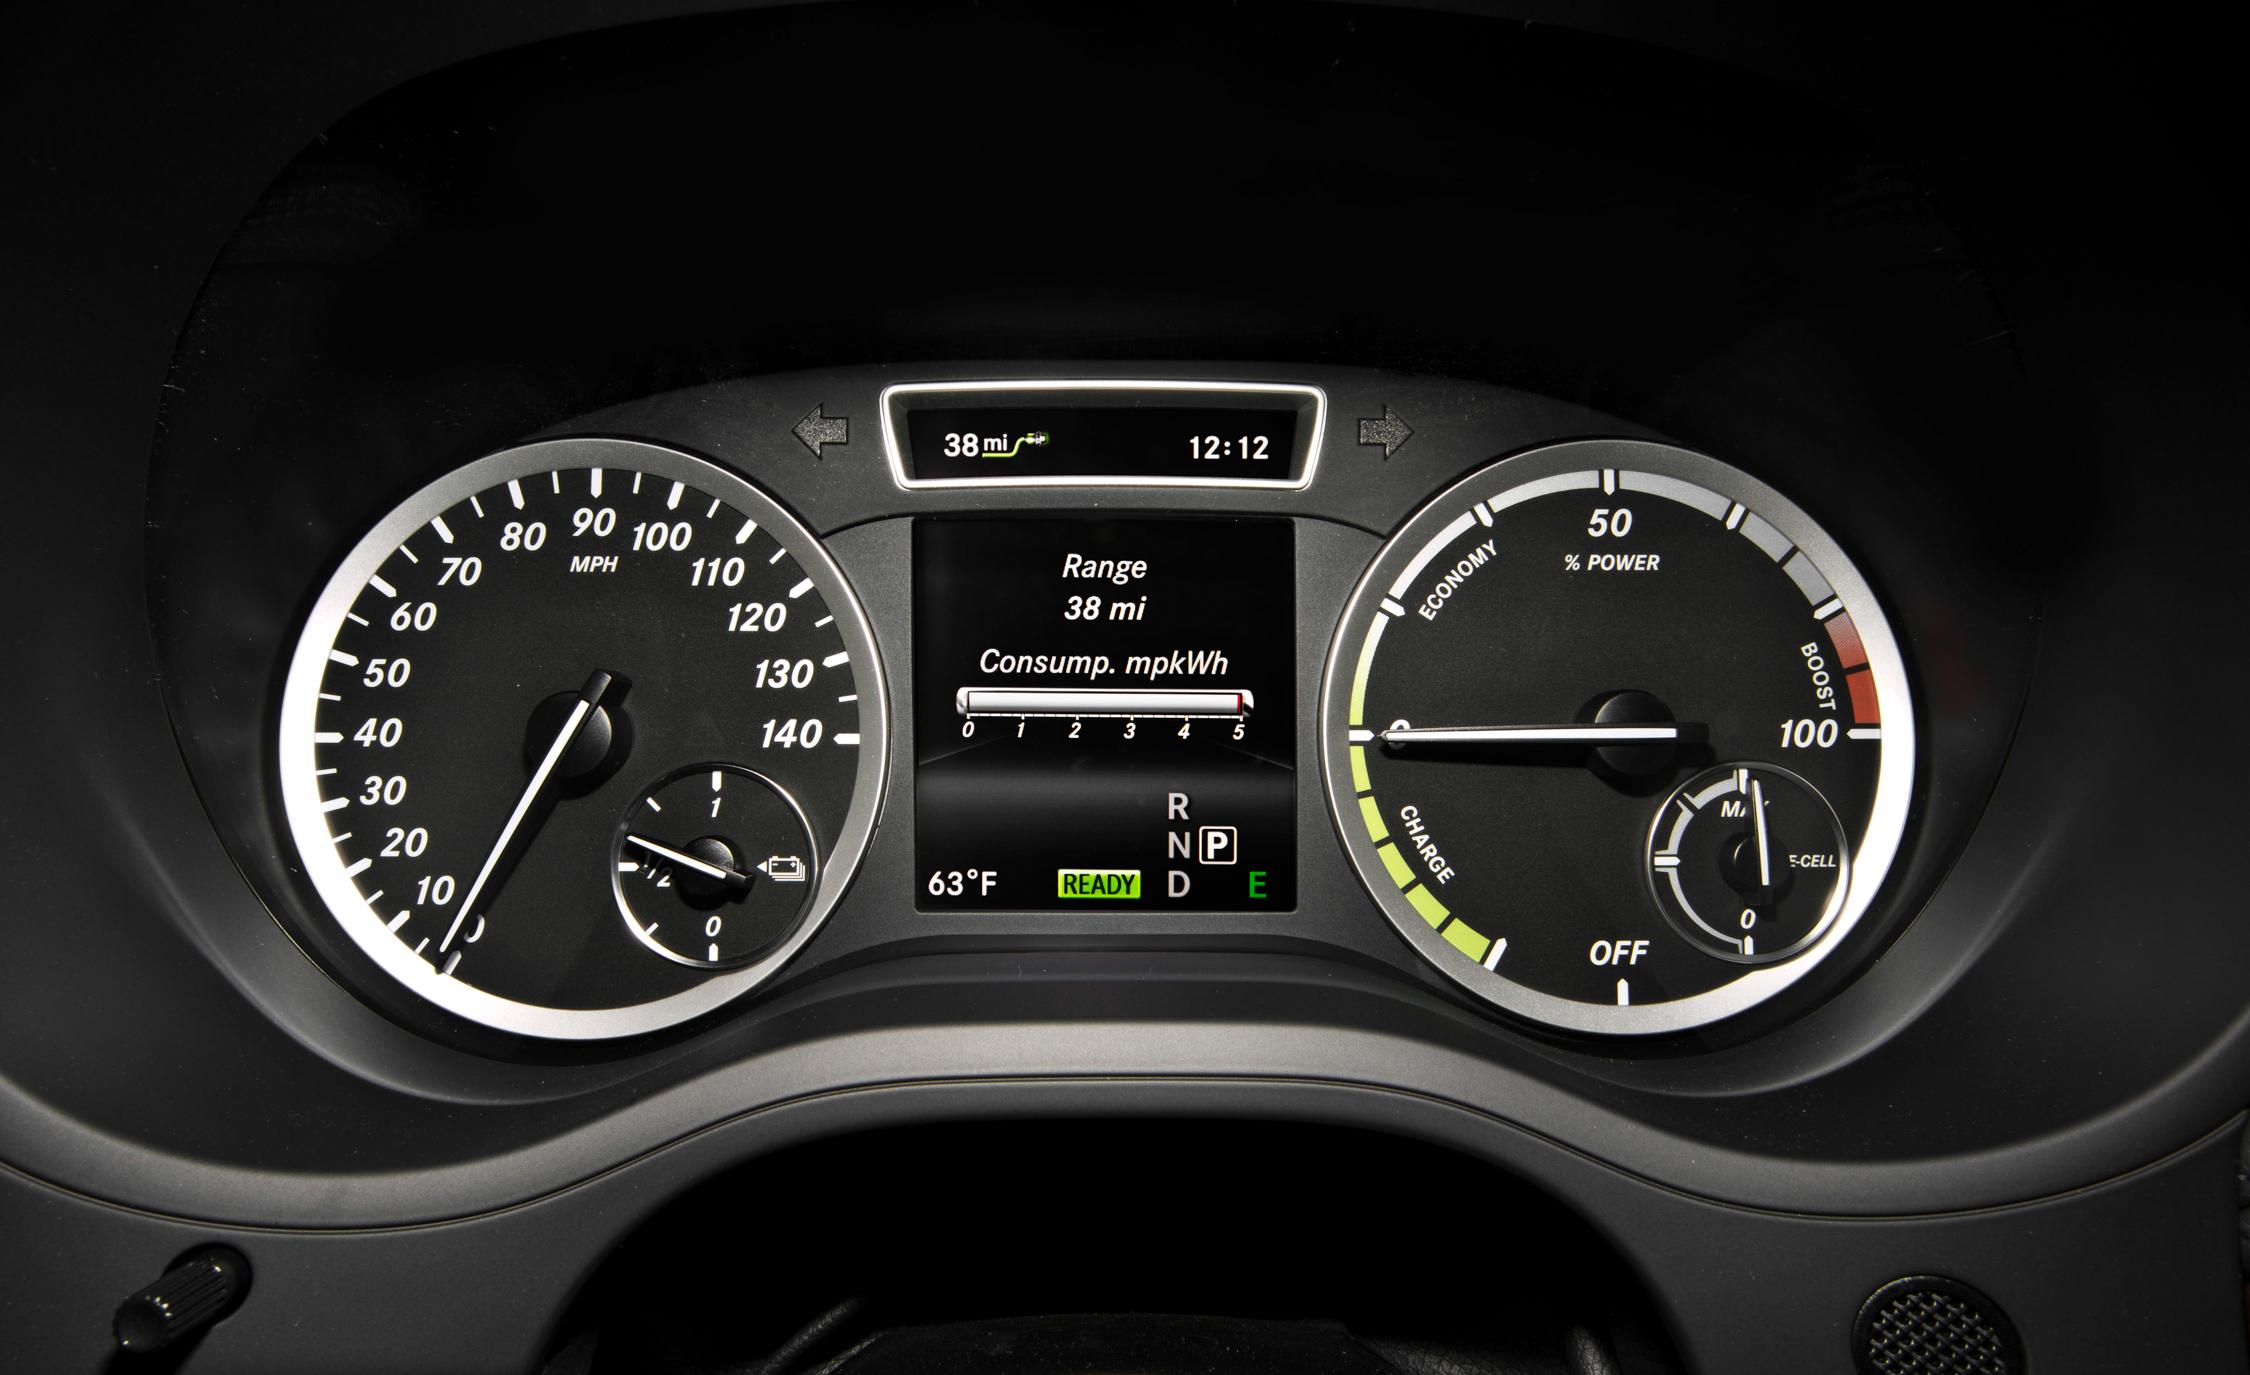 2014 Mercedes-Benz B-class Electric Drive Interior Speedometer